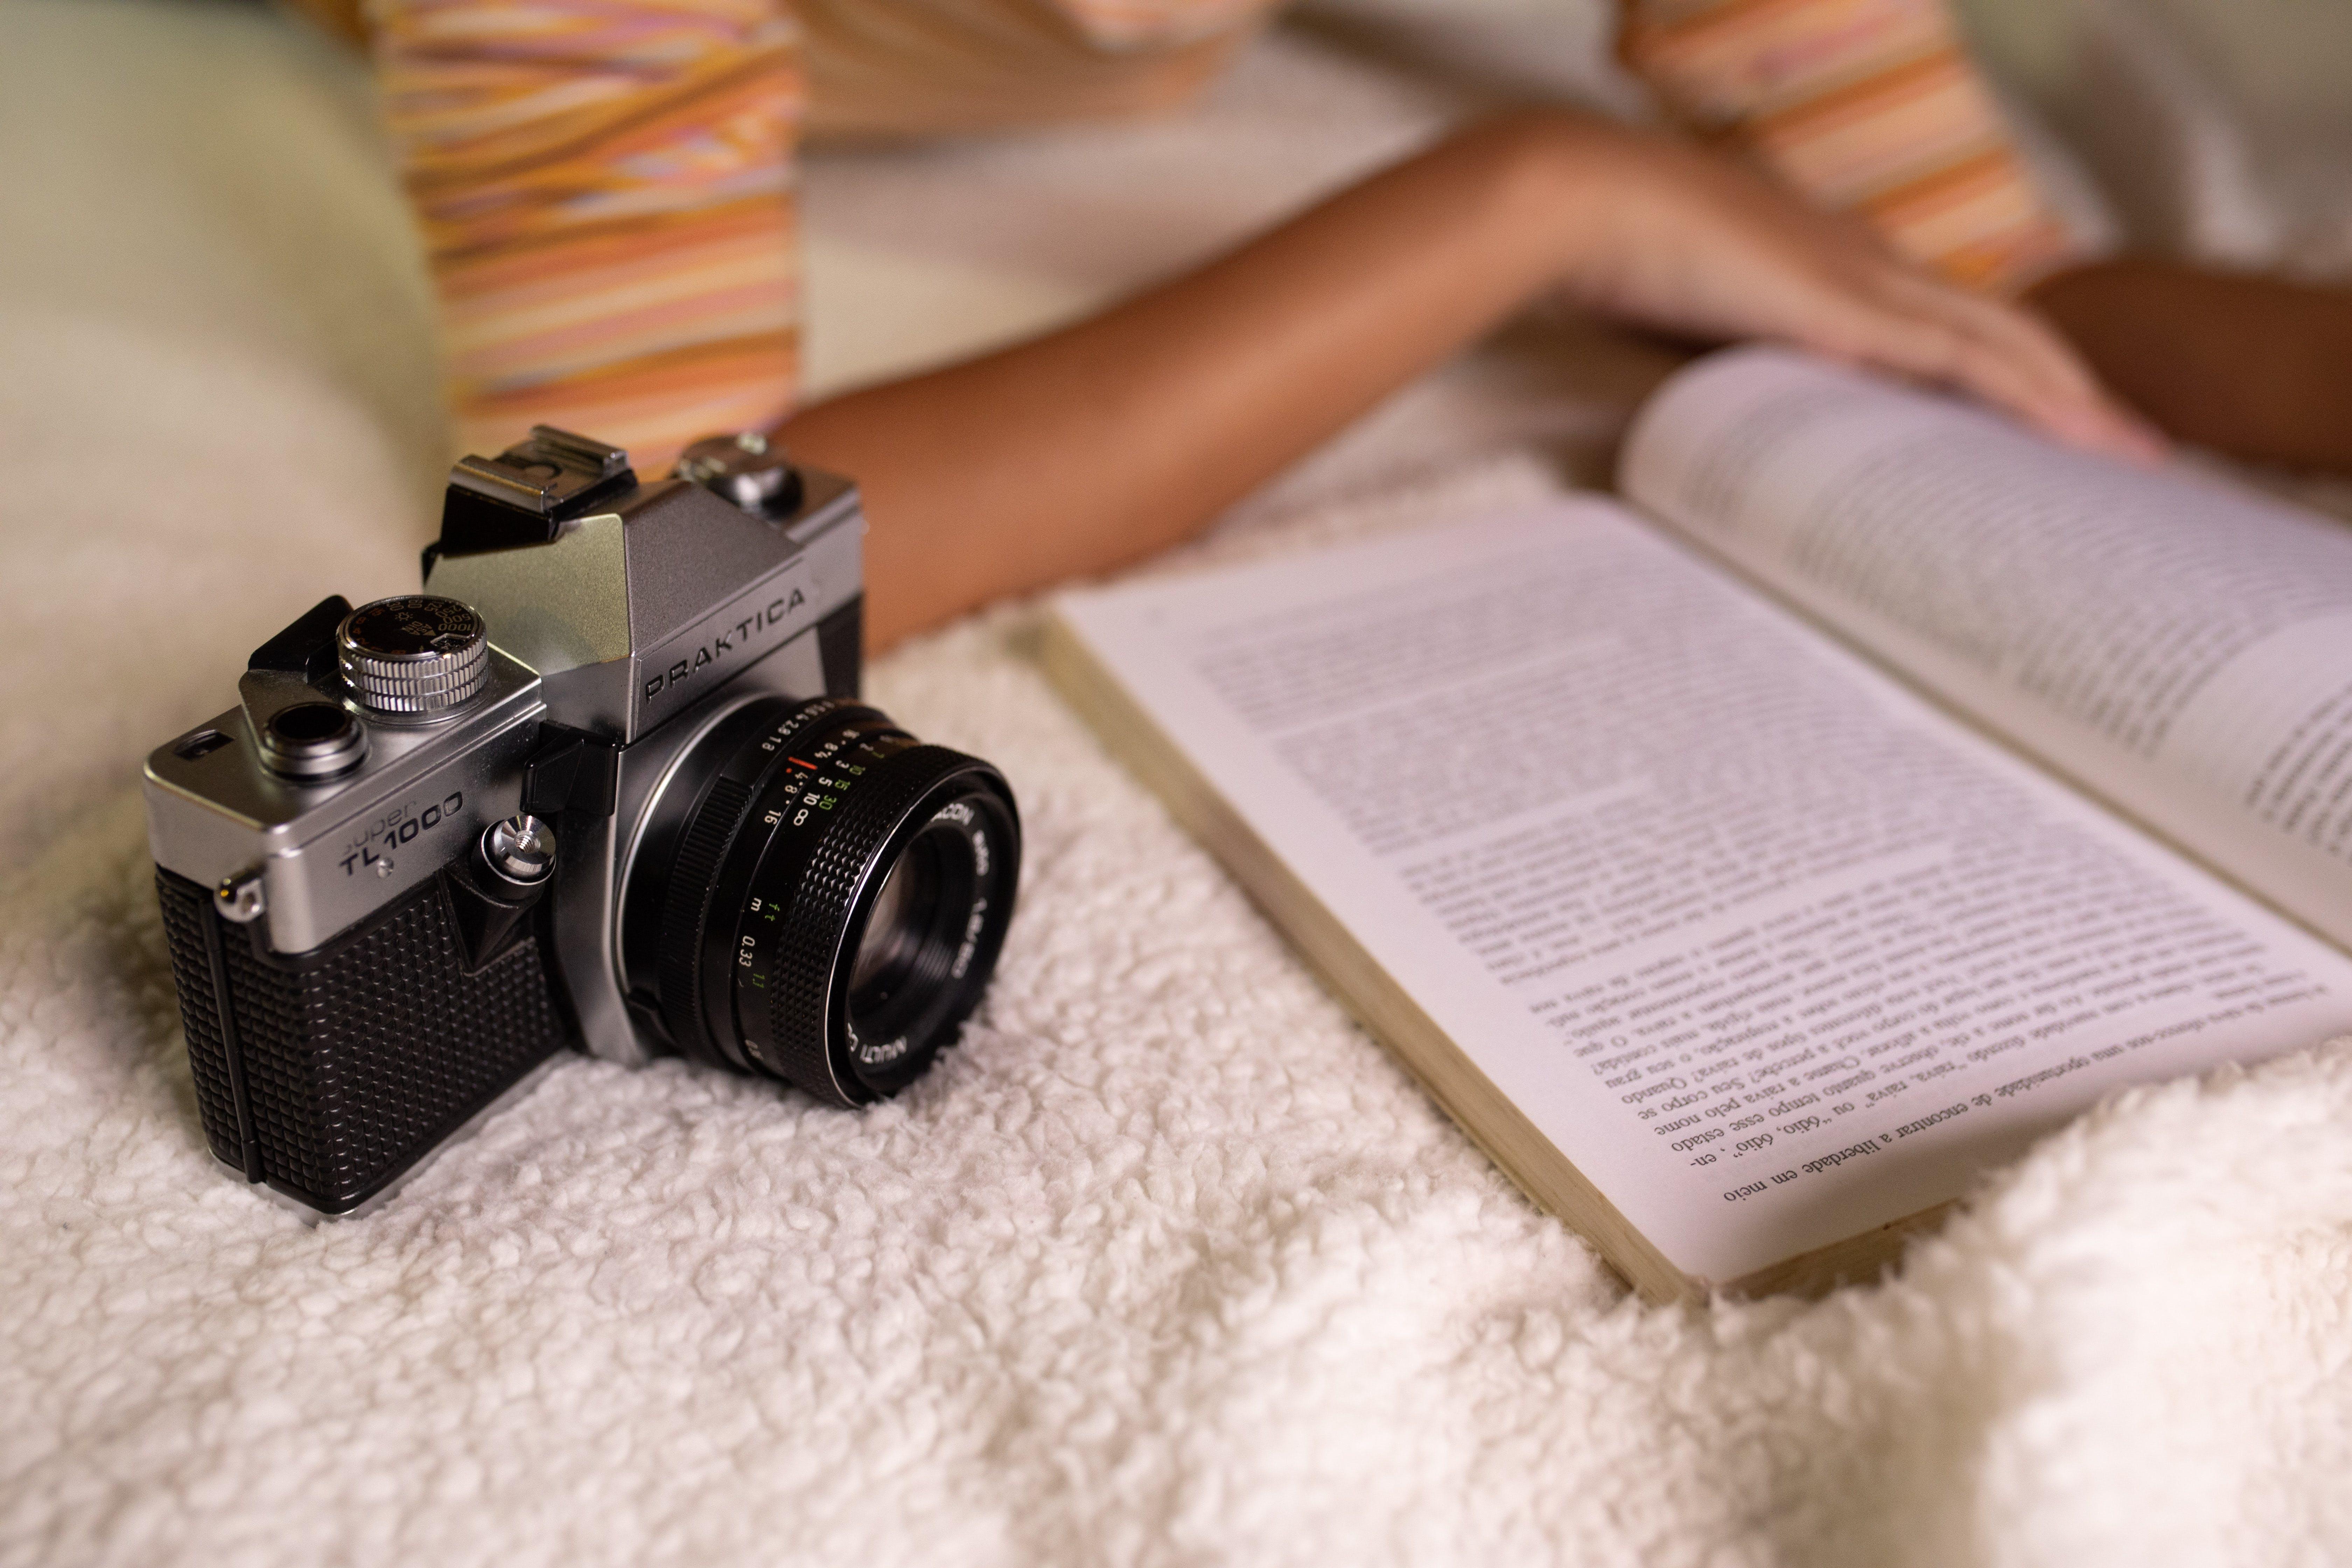 Black Slr Camera Beside Open Book